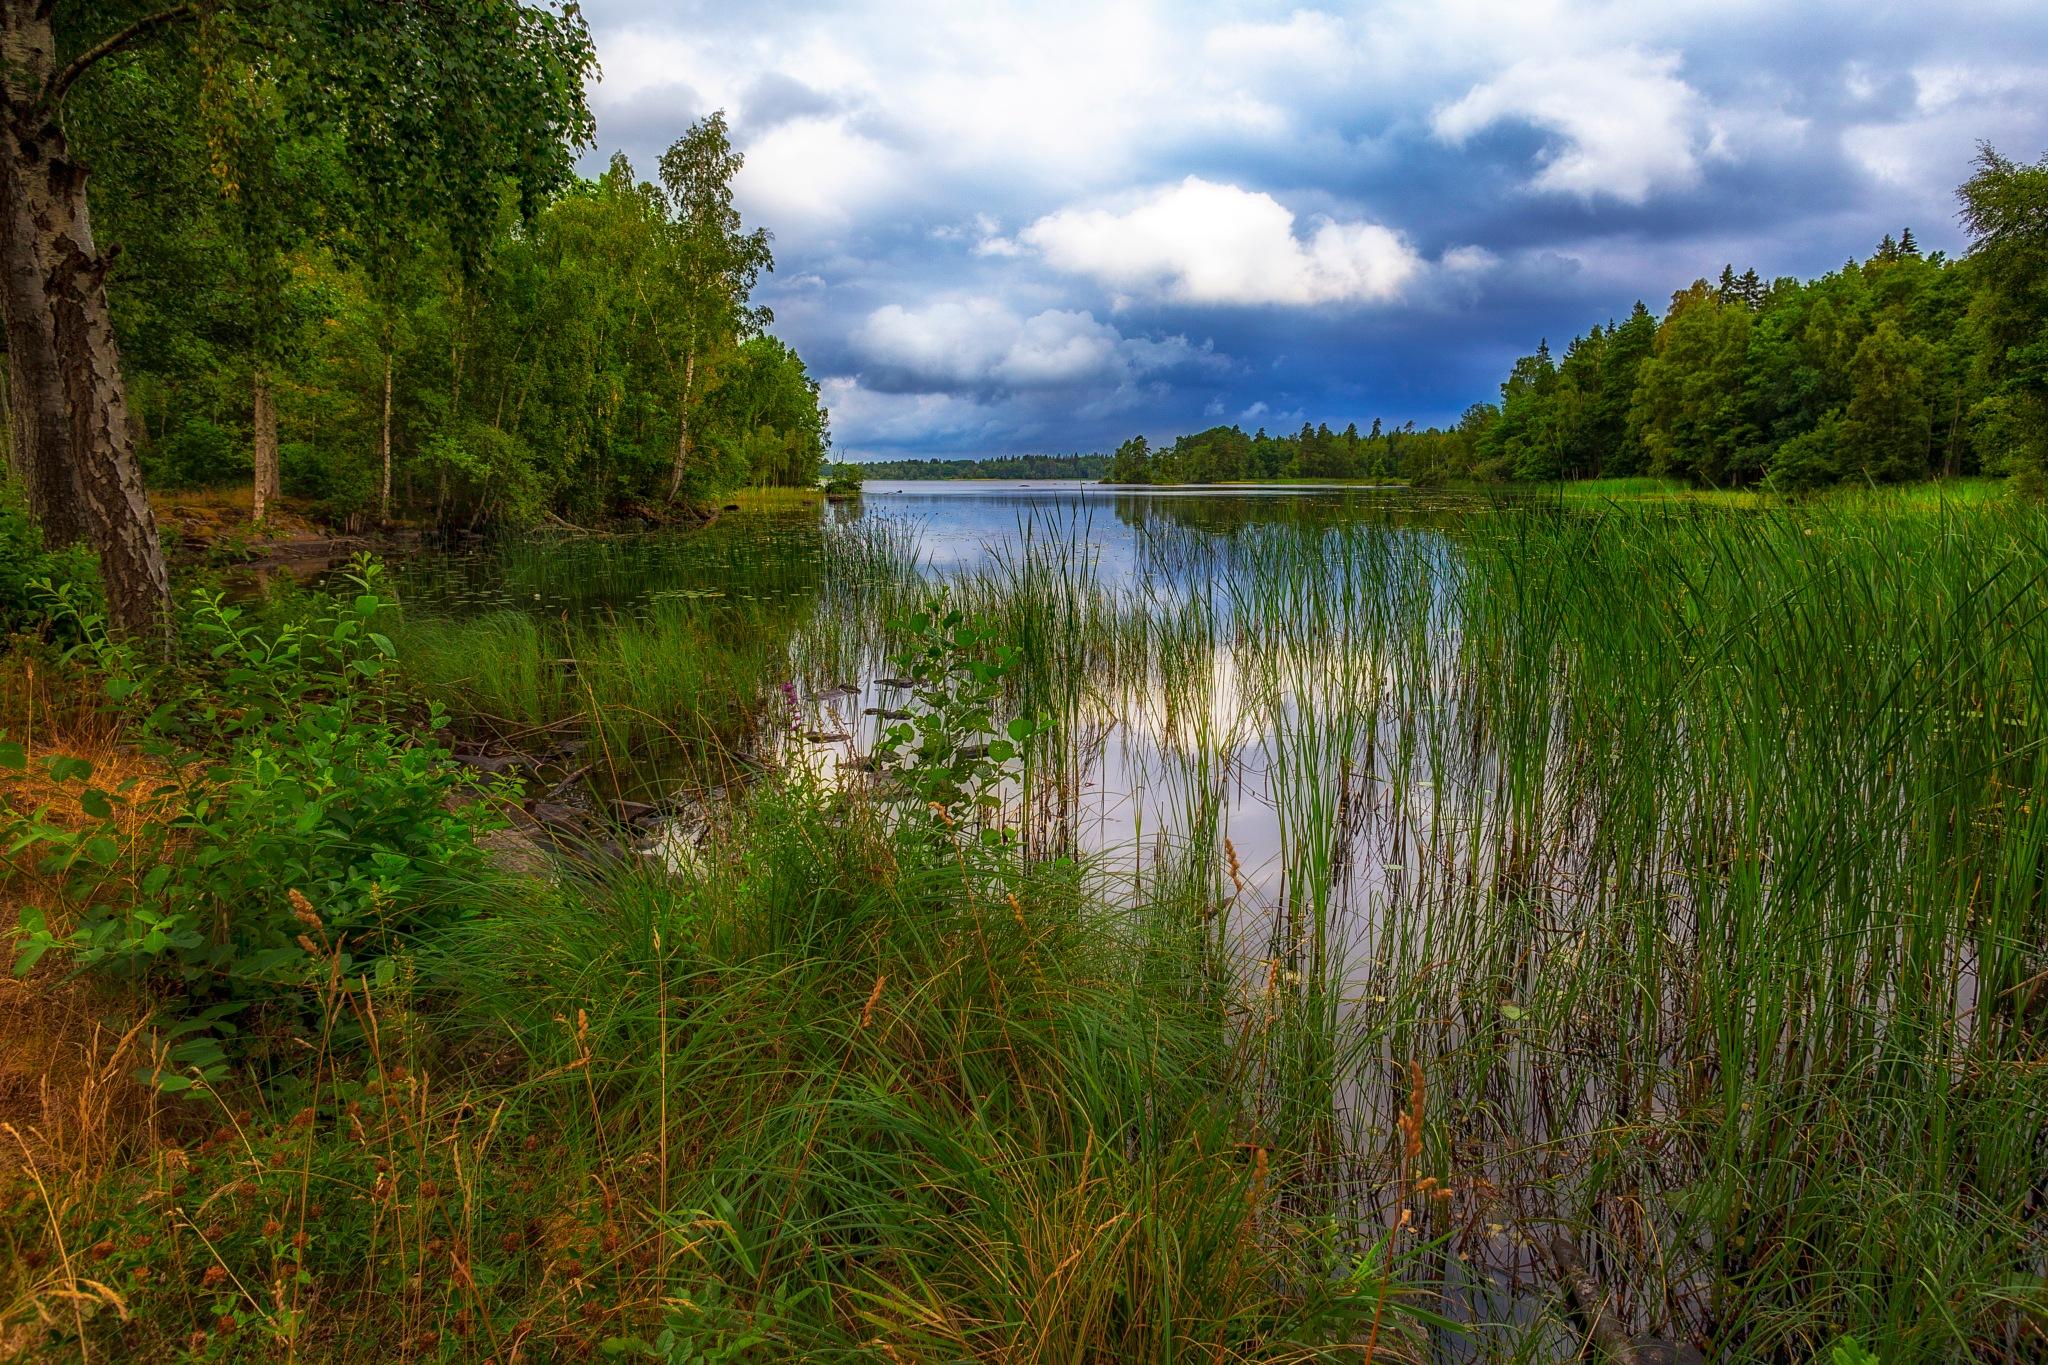 Summer Morning at the Lake by carljan w carlsson